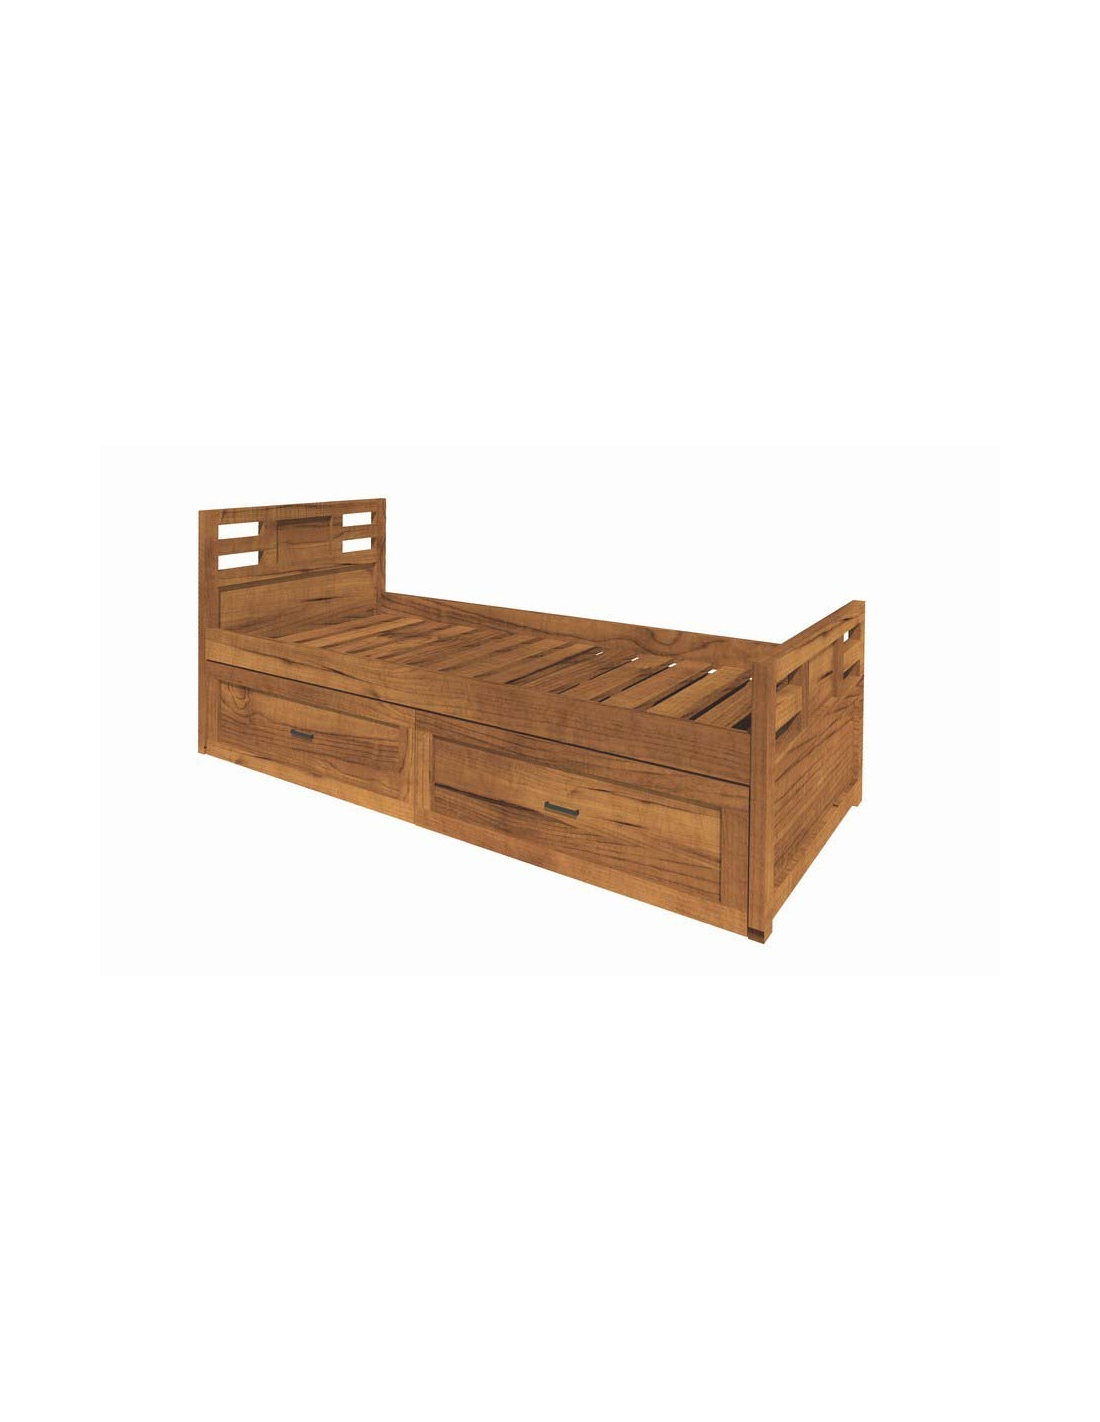 Comprar cama nido de 90 cm con cajones de madera modular - Mueble cama nido ...